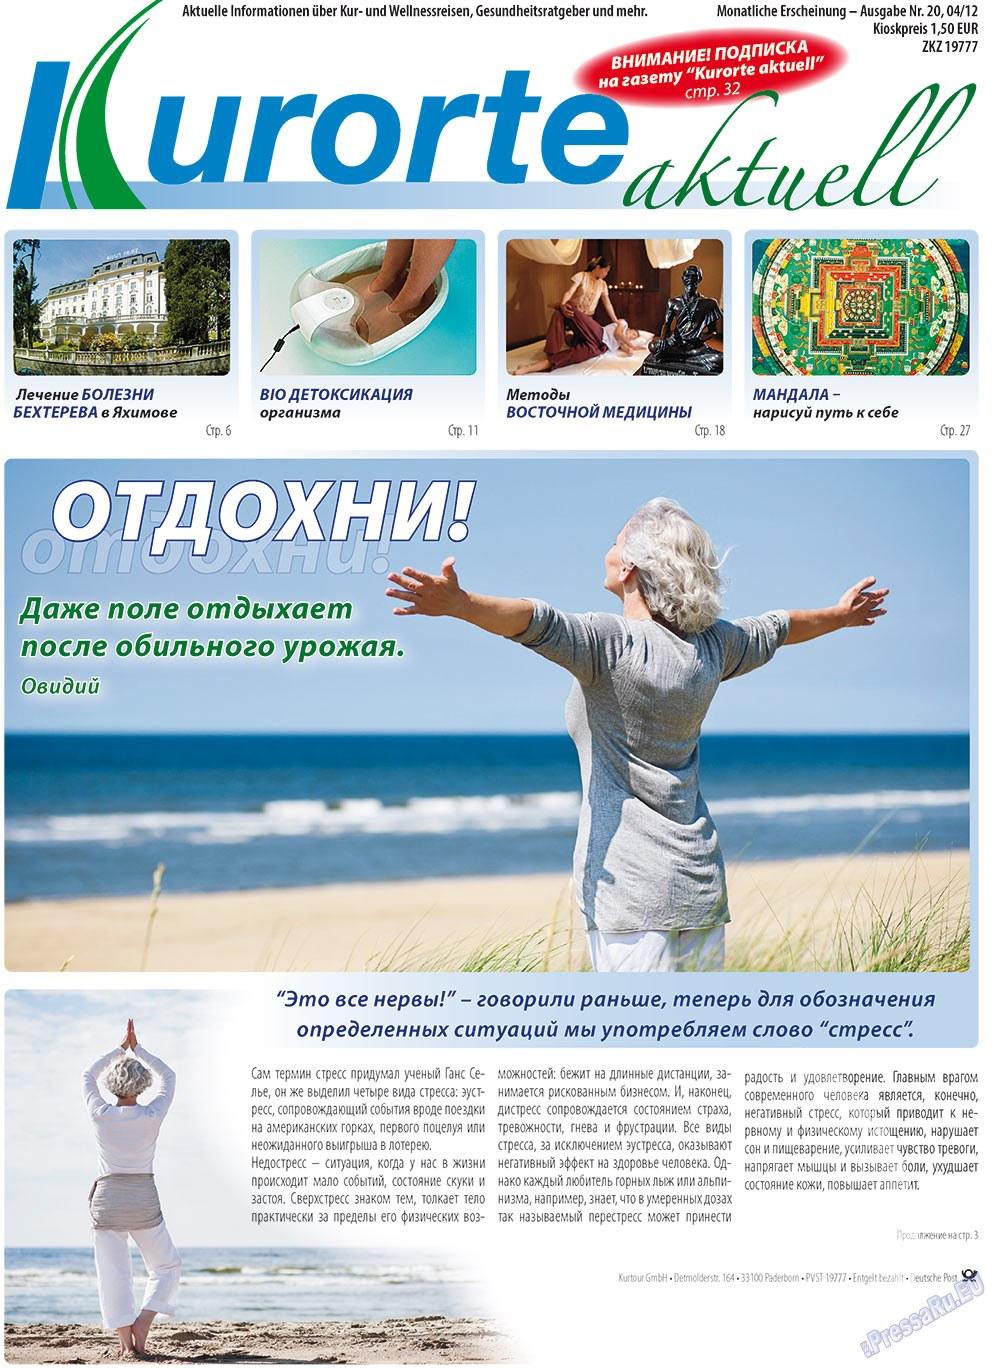 Kurorte aktuell (газета). 2012 год, номер 20, стр. 1